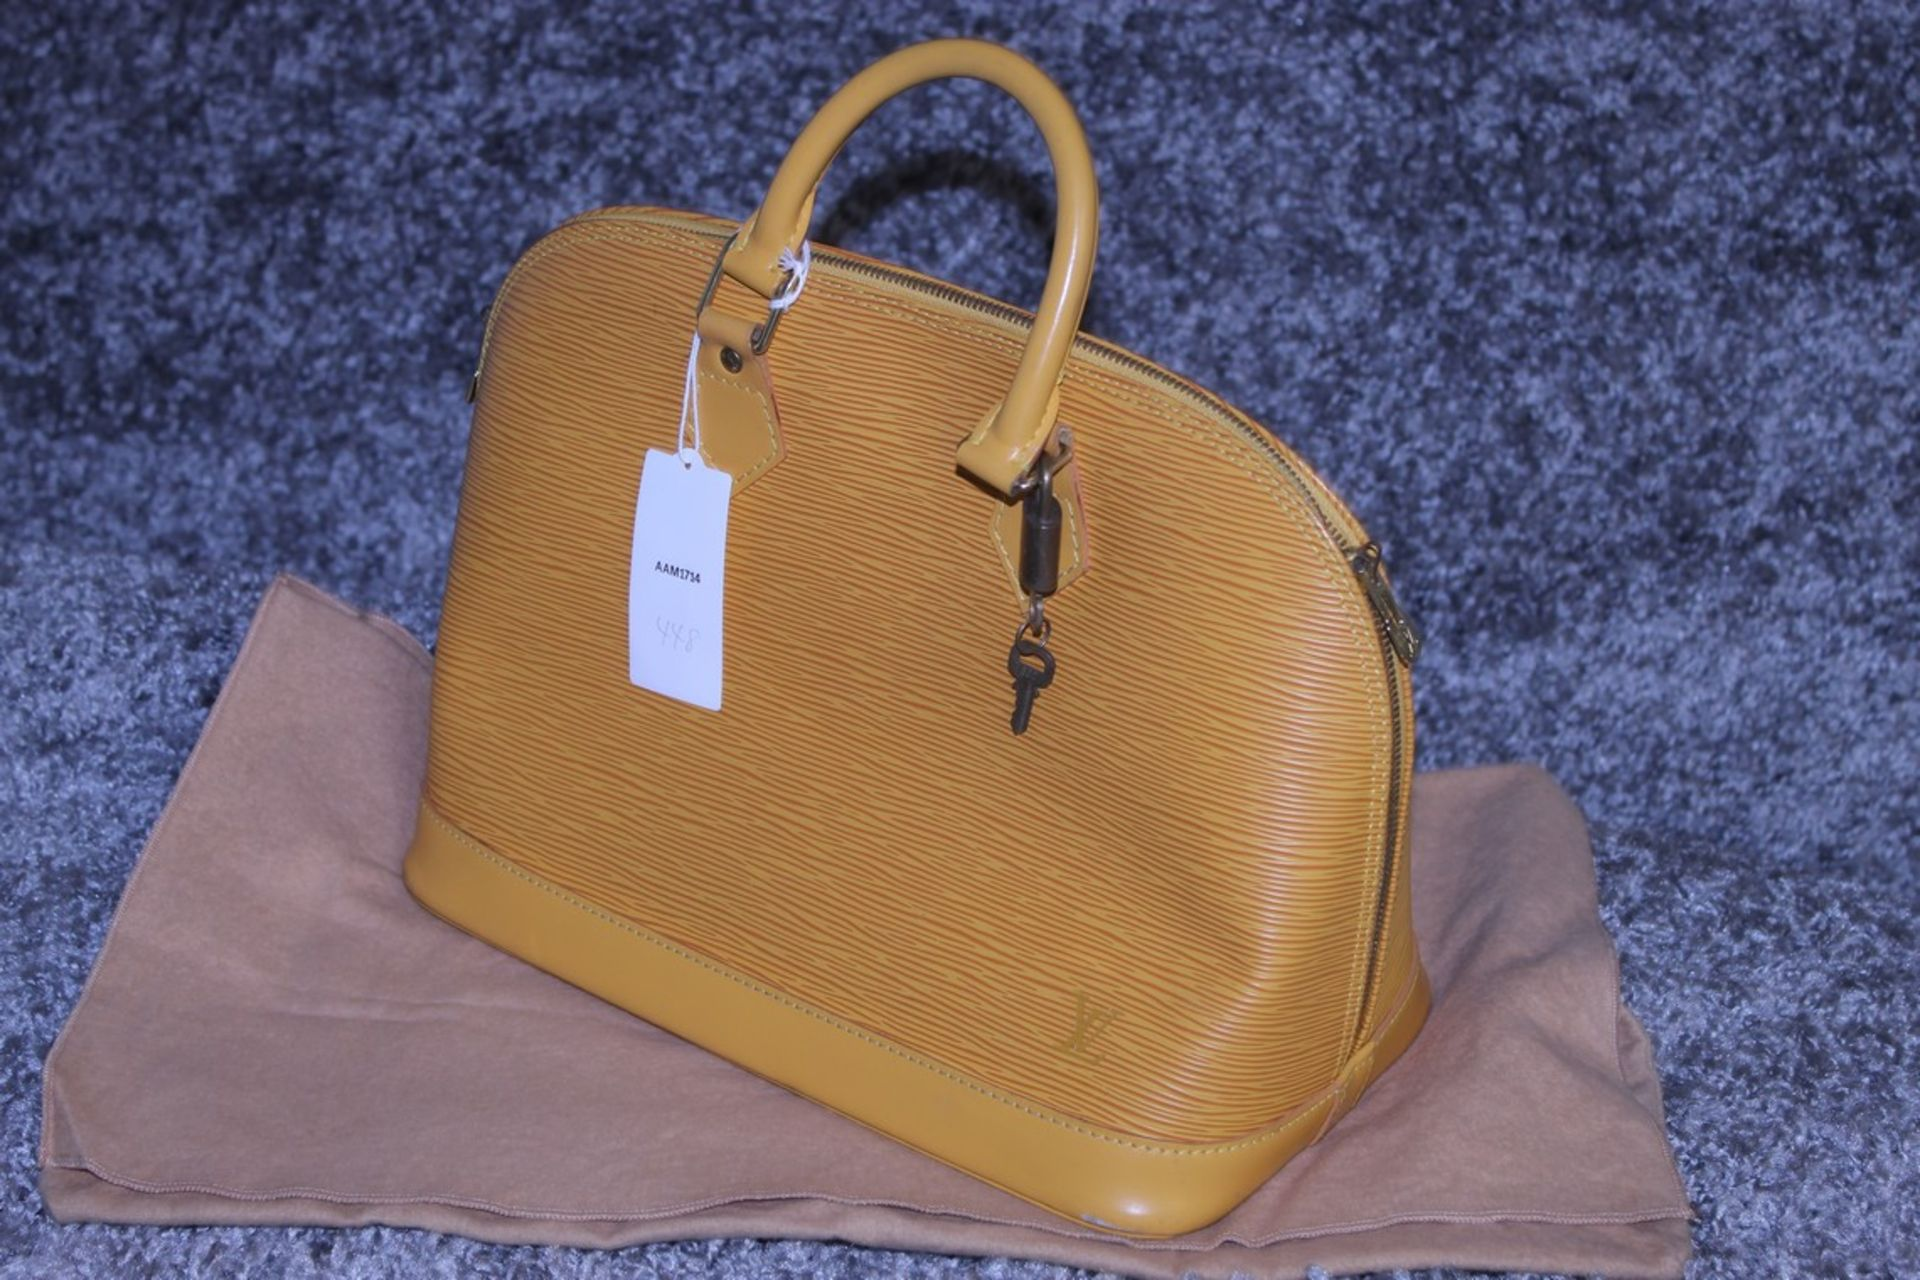 RRP £1,700 Louis Vuitton Alma Yellow Calf Epi Leather Handbag, Complete With Cadena, Keys & Dust Bag - Image 3 of 4